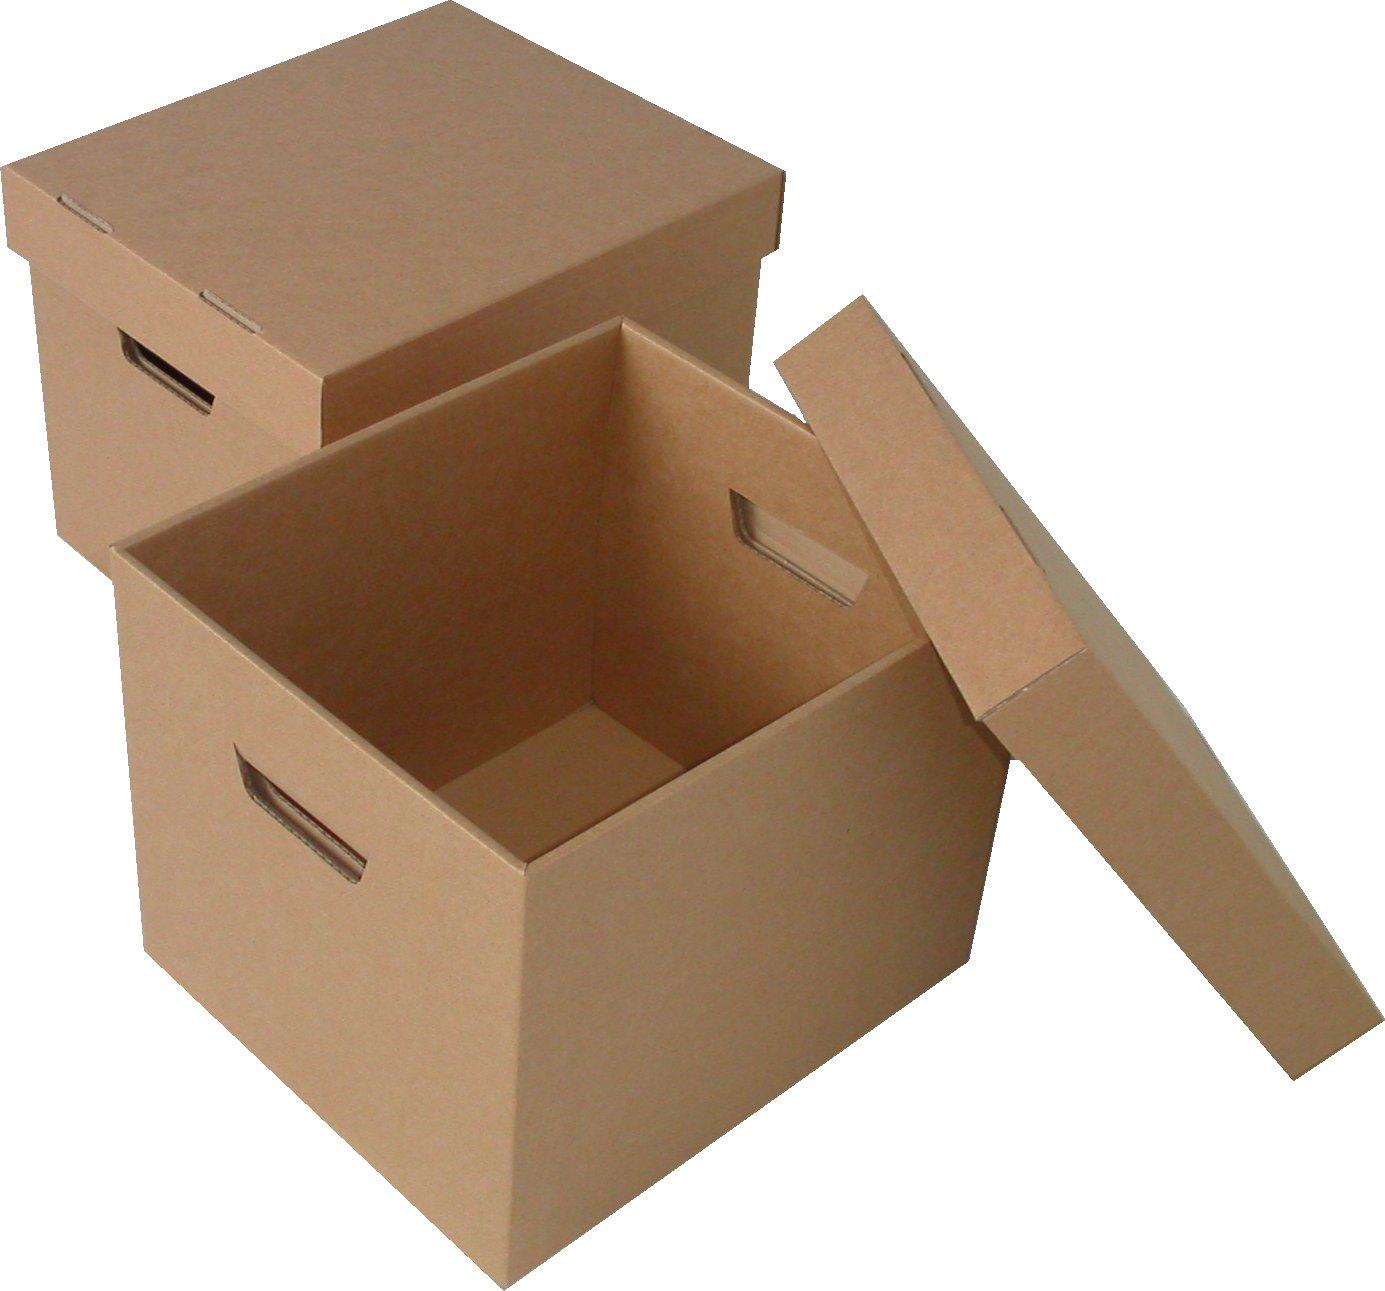 cardboard boxes melbourne